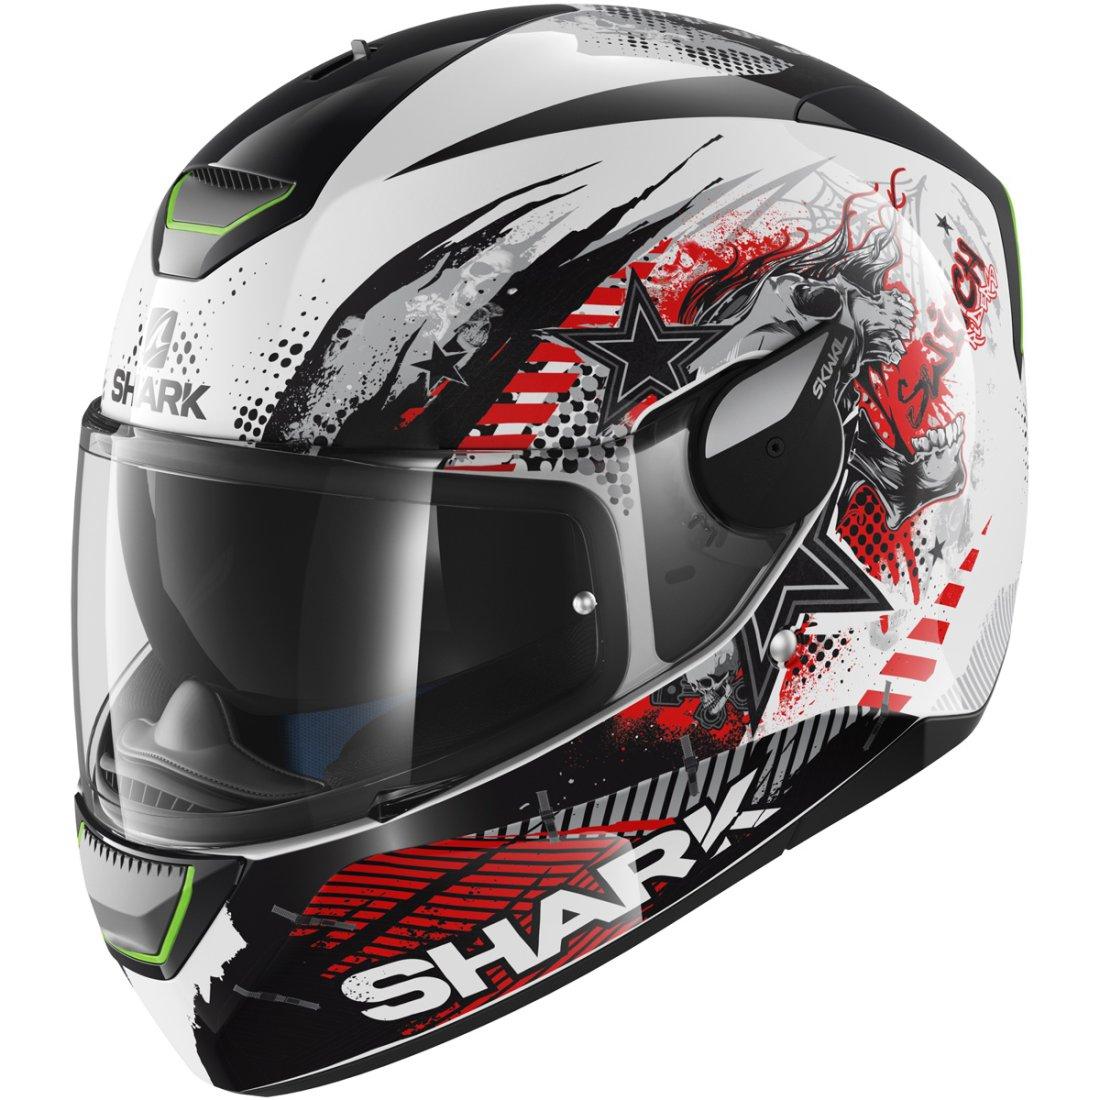 Hilo de los cascos que susurraban a los moteros. Skwal_switch_riders_white_black_red_wkr-1-M-06670796-xlarge